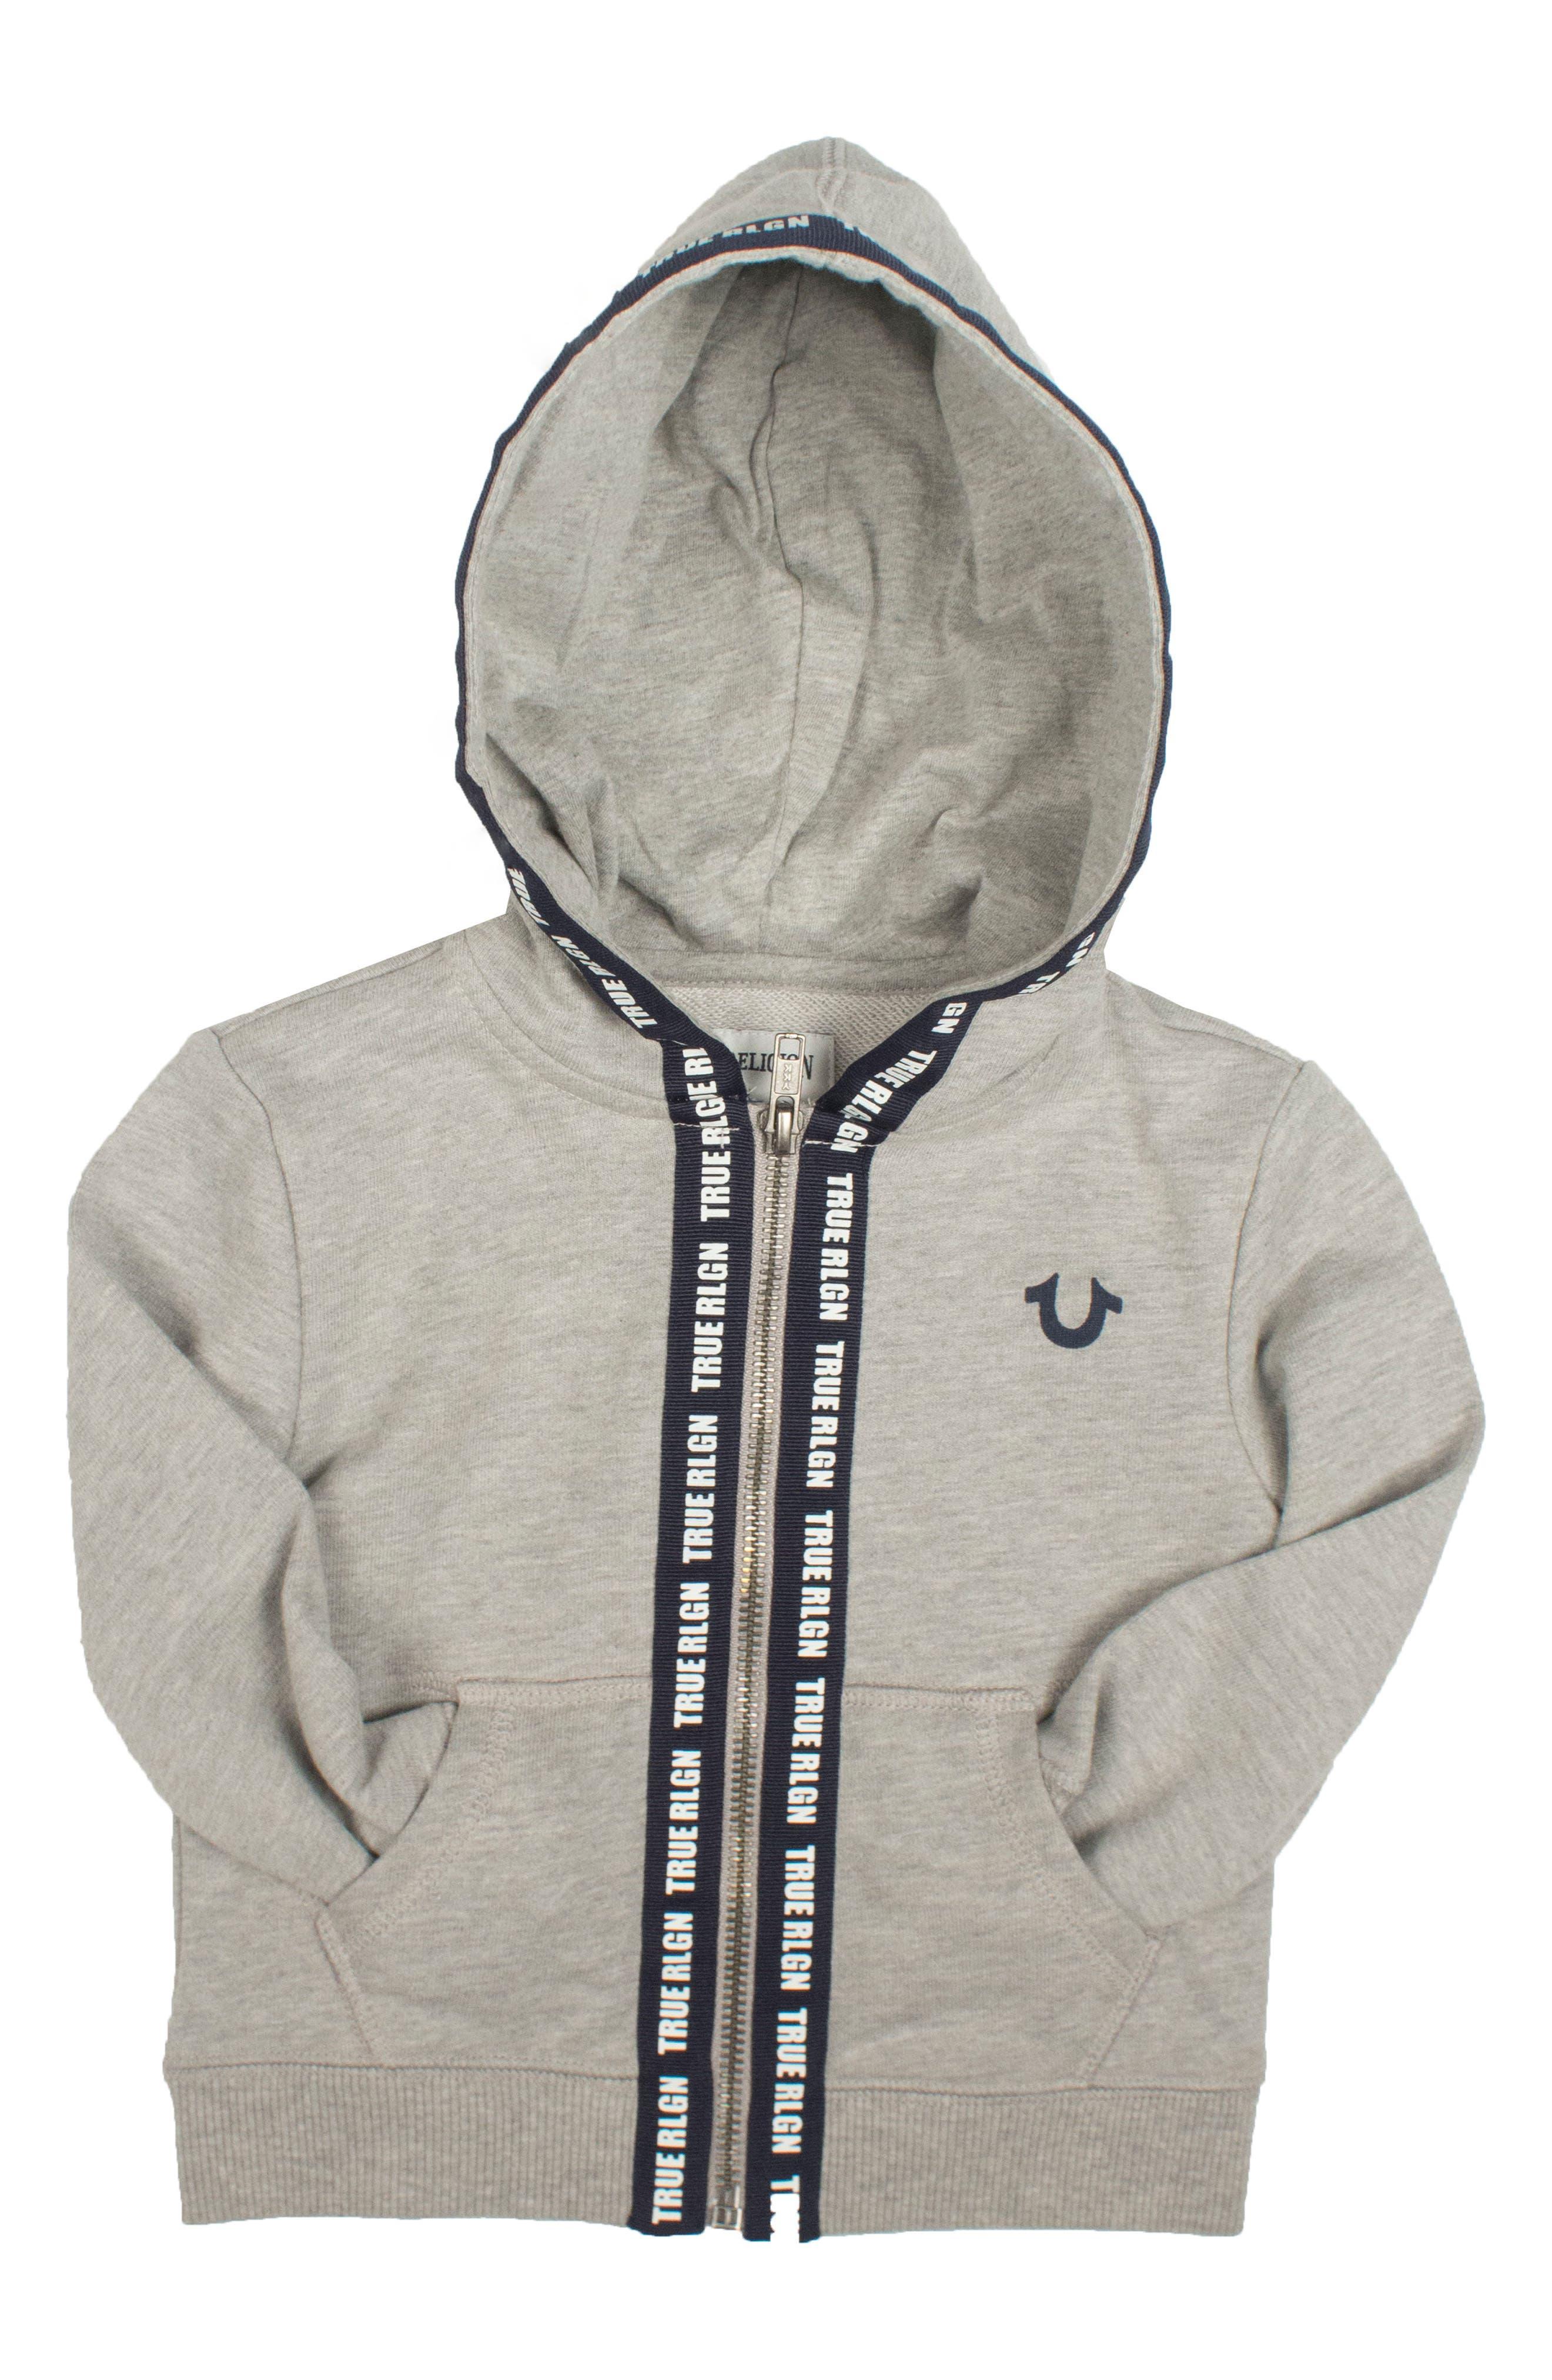 Main Image - True Religion Brand Jeans Tape Zip Hoodie (Big Boys)